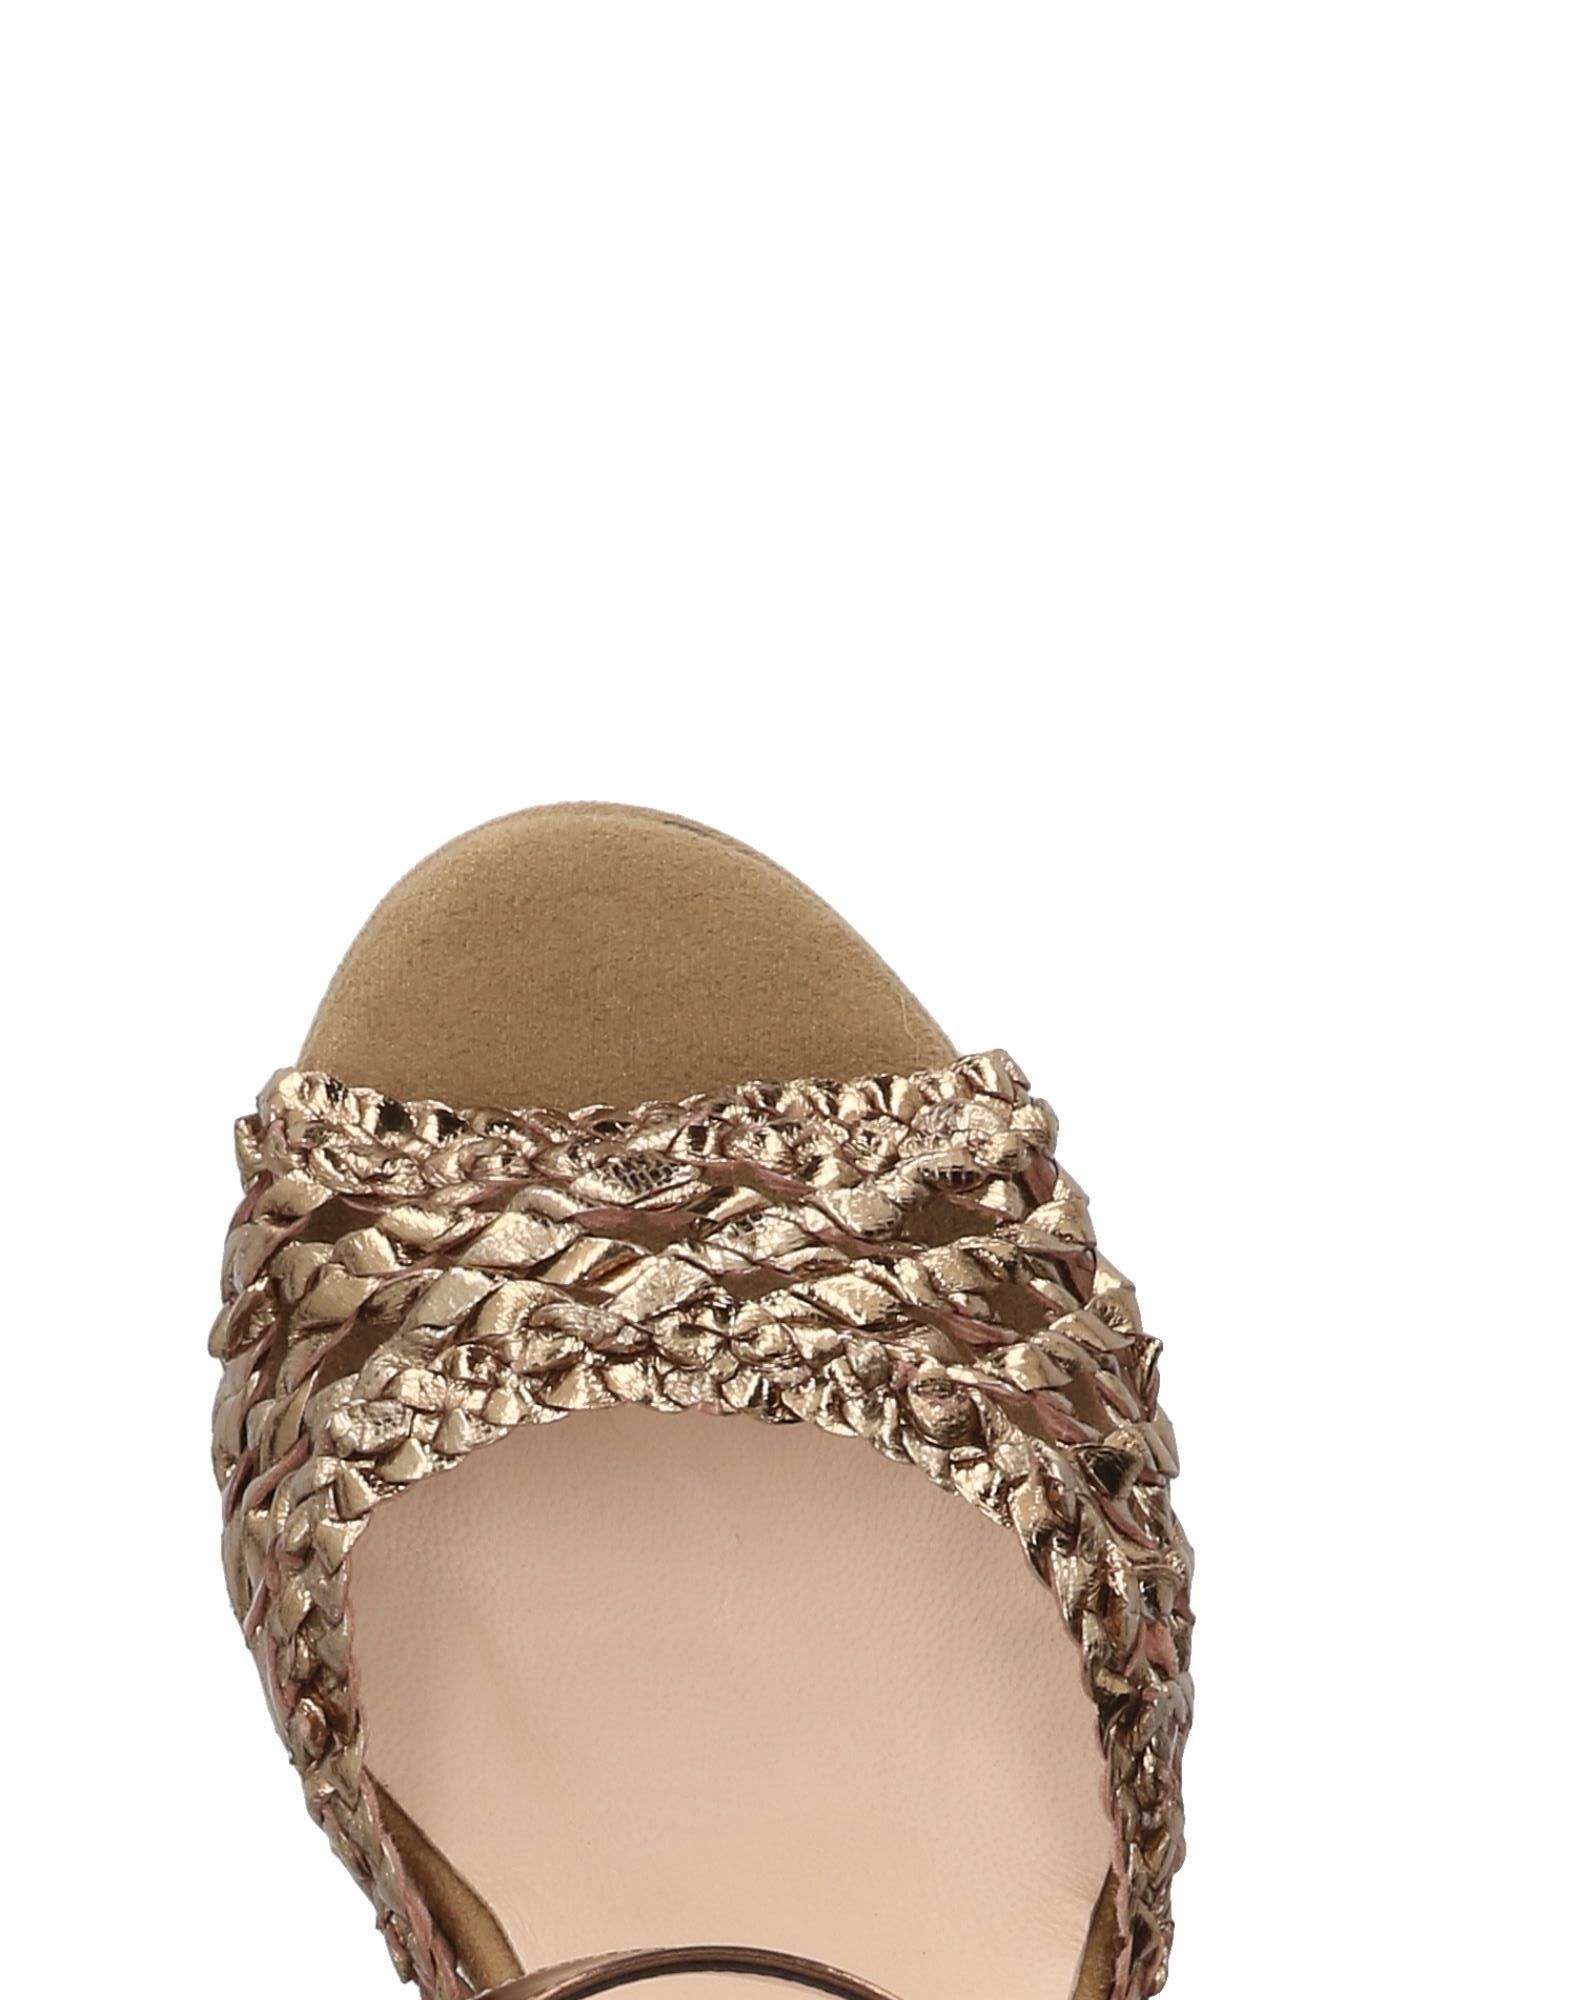 bact & # bact 225; dei toi sandales - femmes bact # & # 225; dei (royaume - uni - 11433728wo sandales en ligne f7a279